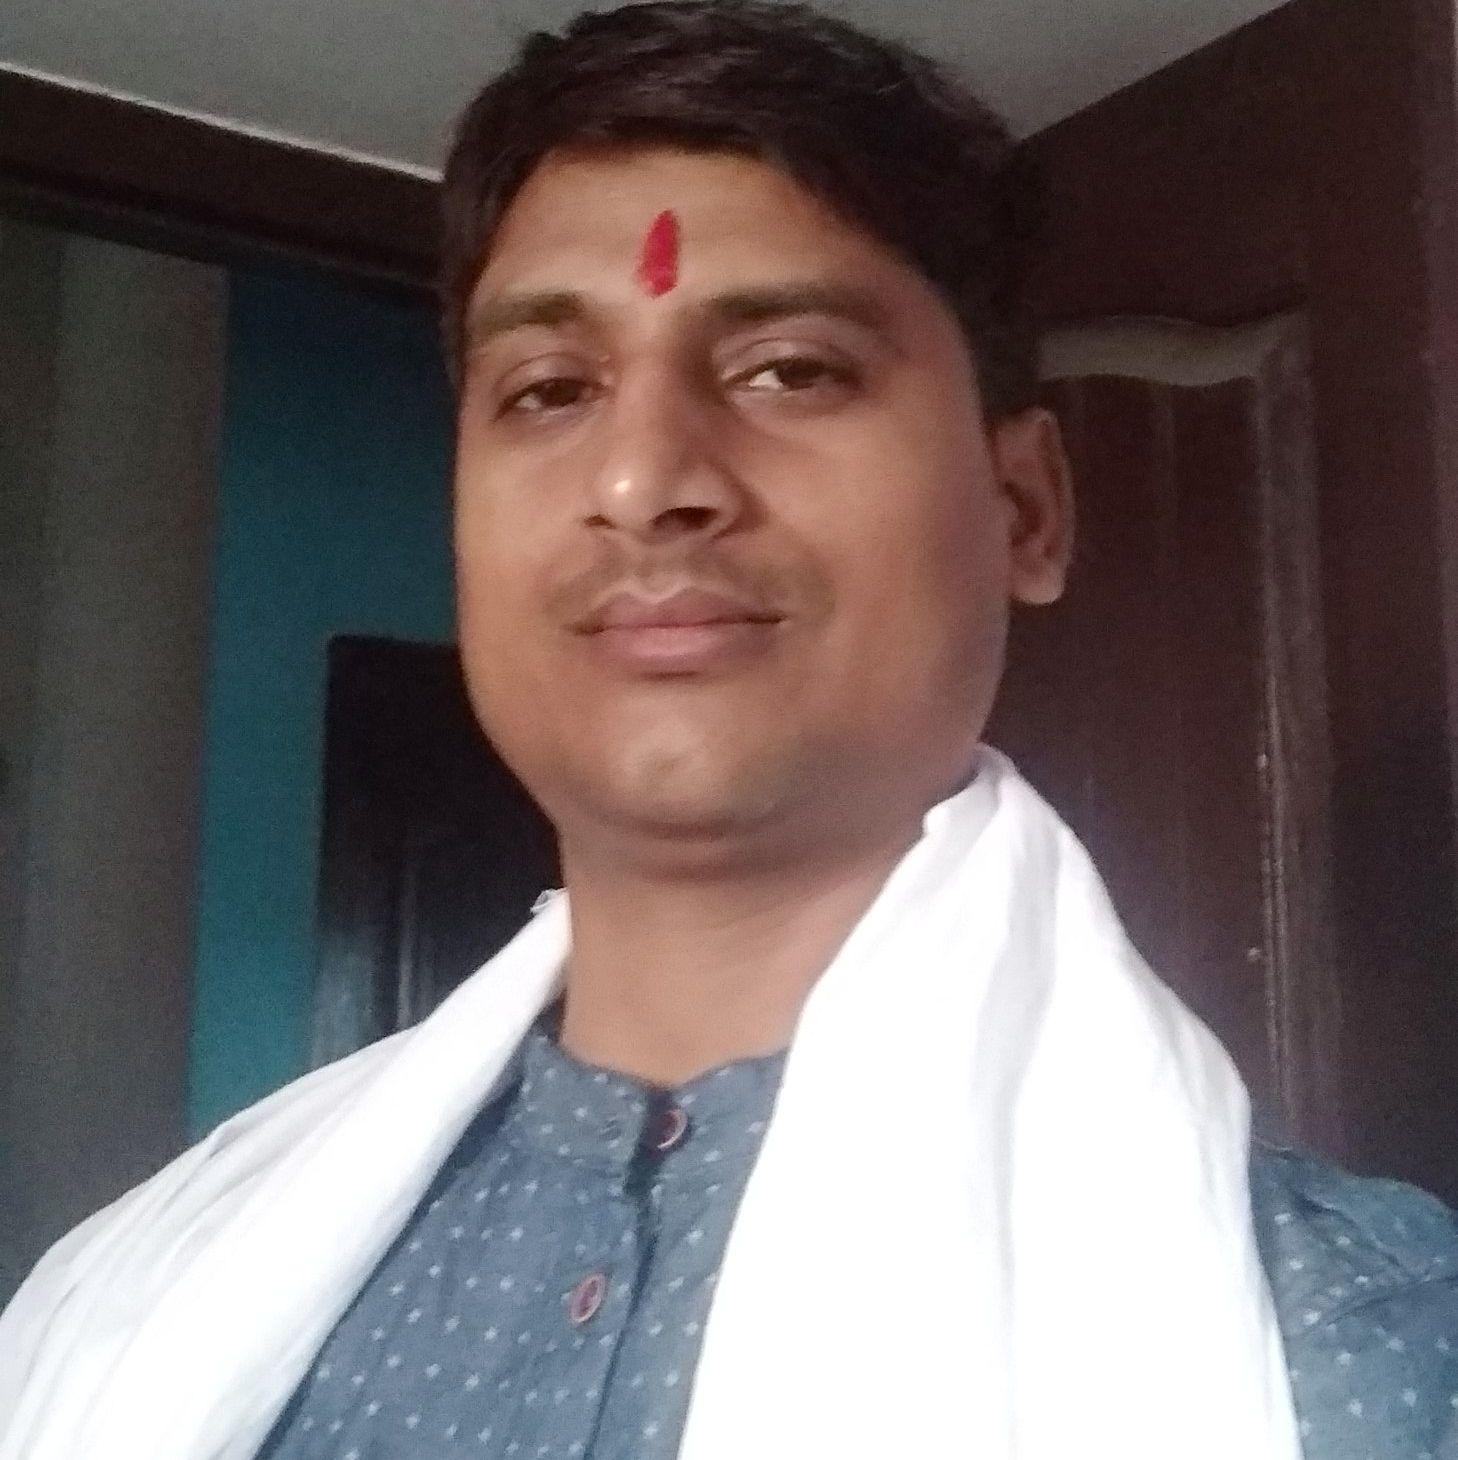 ज्योतिषाचार्य श्री दिलीप शास्त्री जी dilippandey318@gmail.com